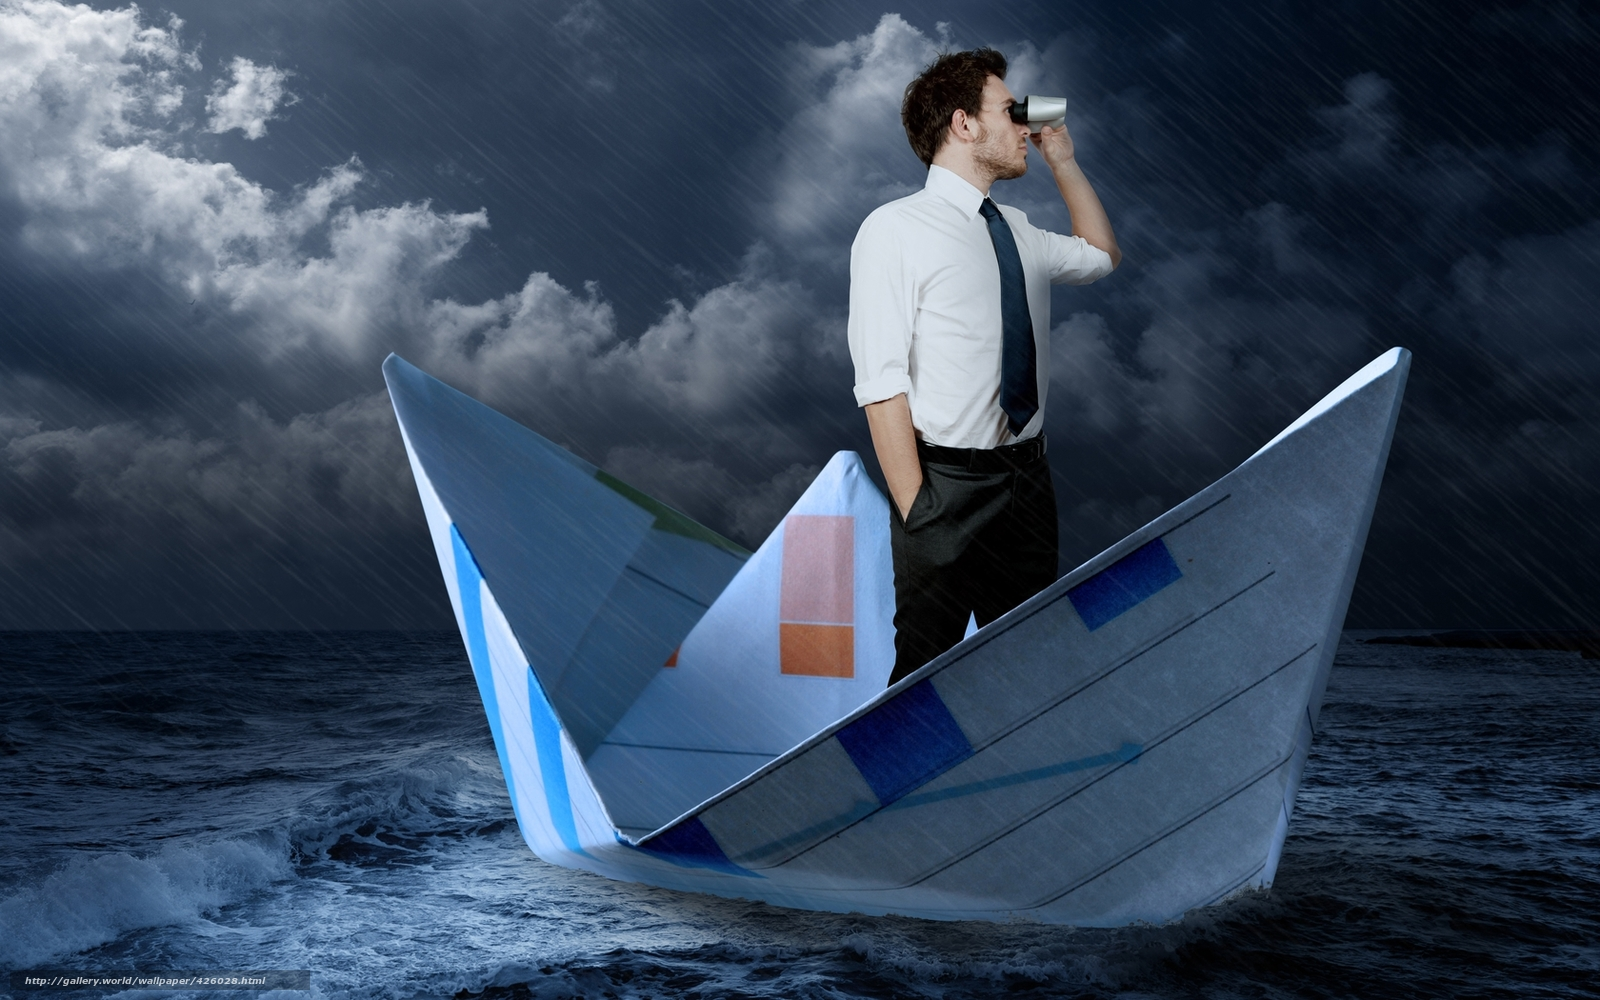 Baixar Wallpaper mar,  tempestade,  chuva,  navio Papis de parede grtis na resoluo 1680x1050 — quadro №426028